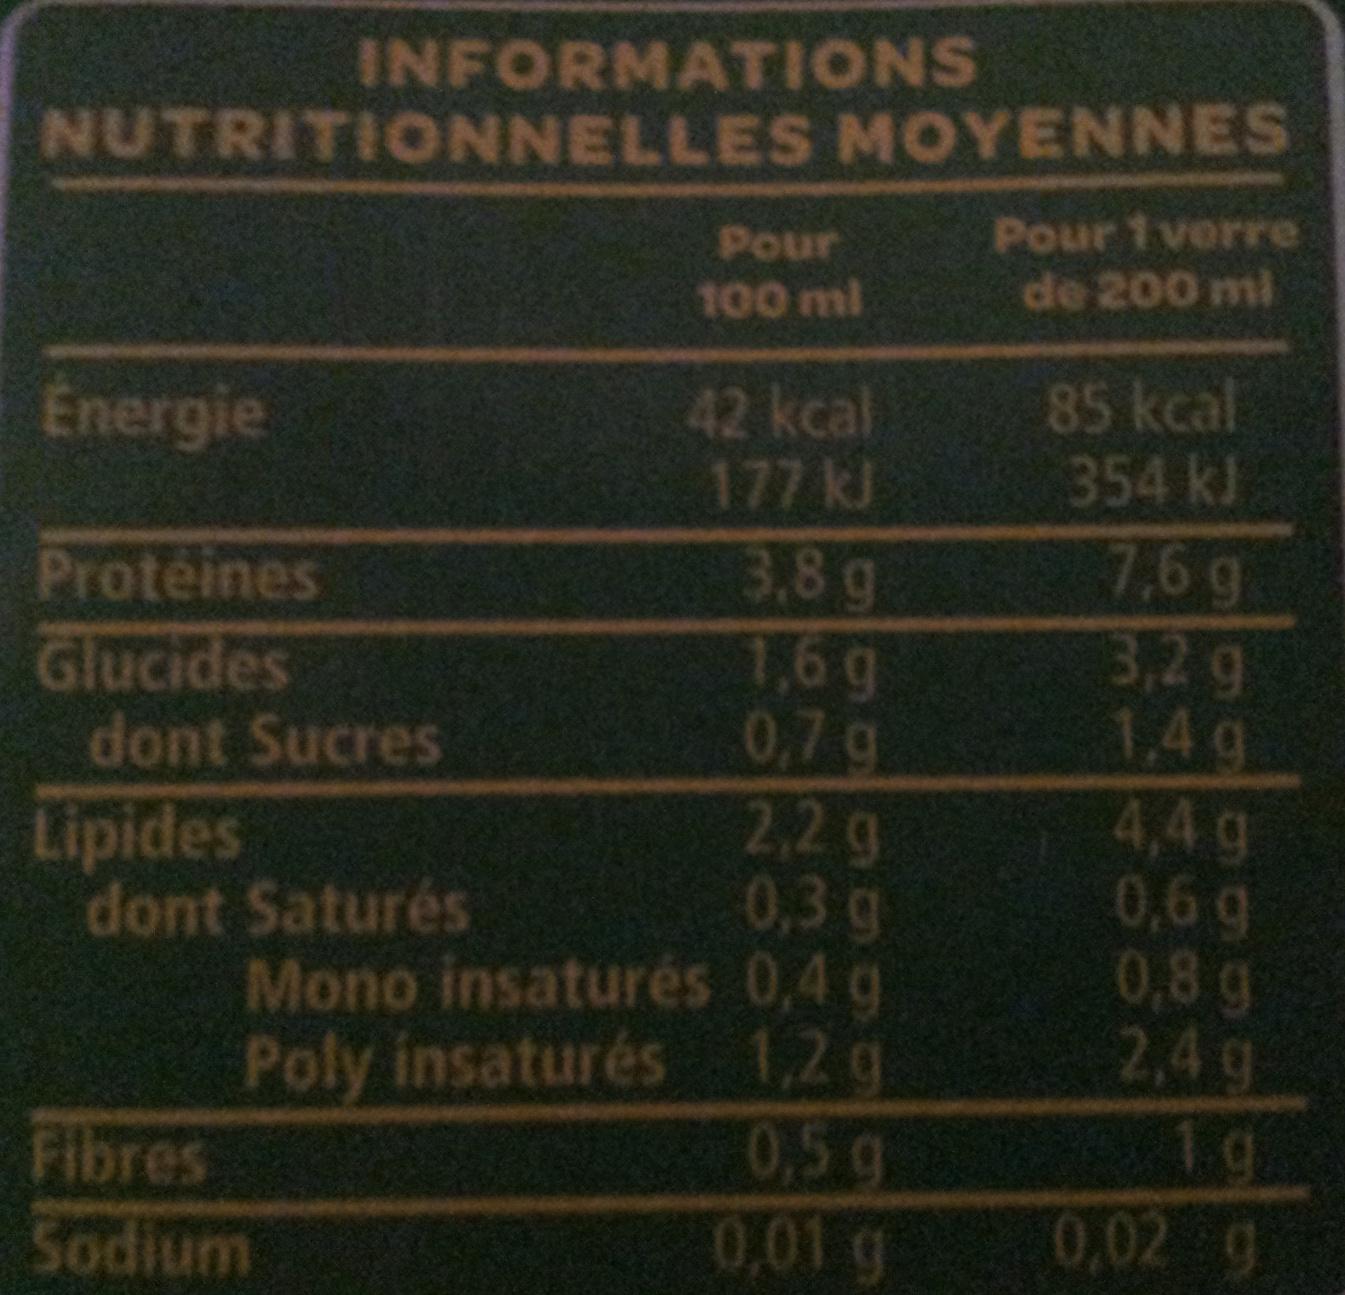 Boisson Soja Nature Bio  - Informations nutritionnelles